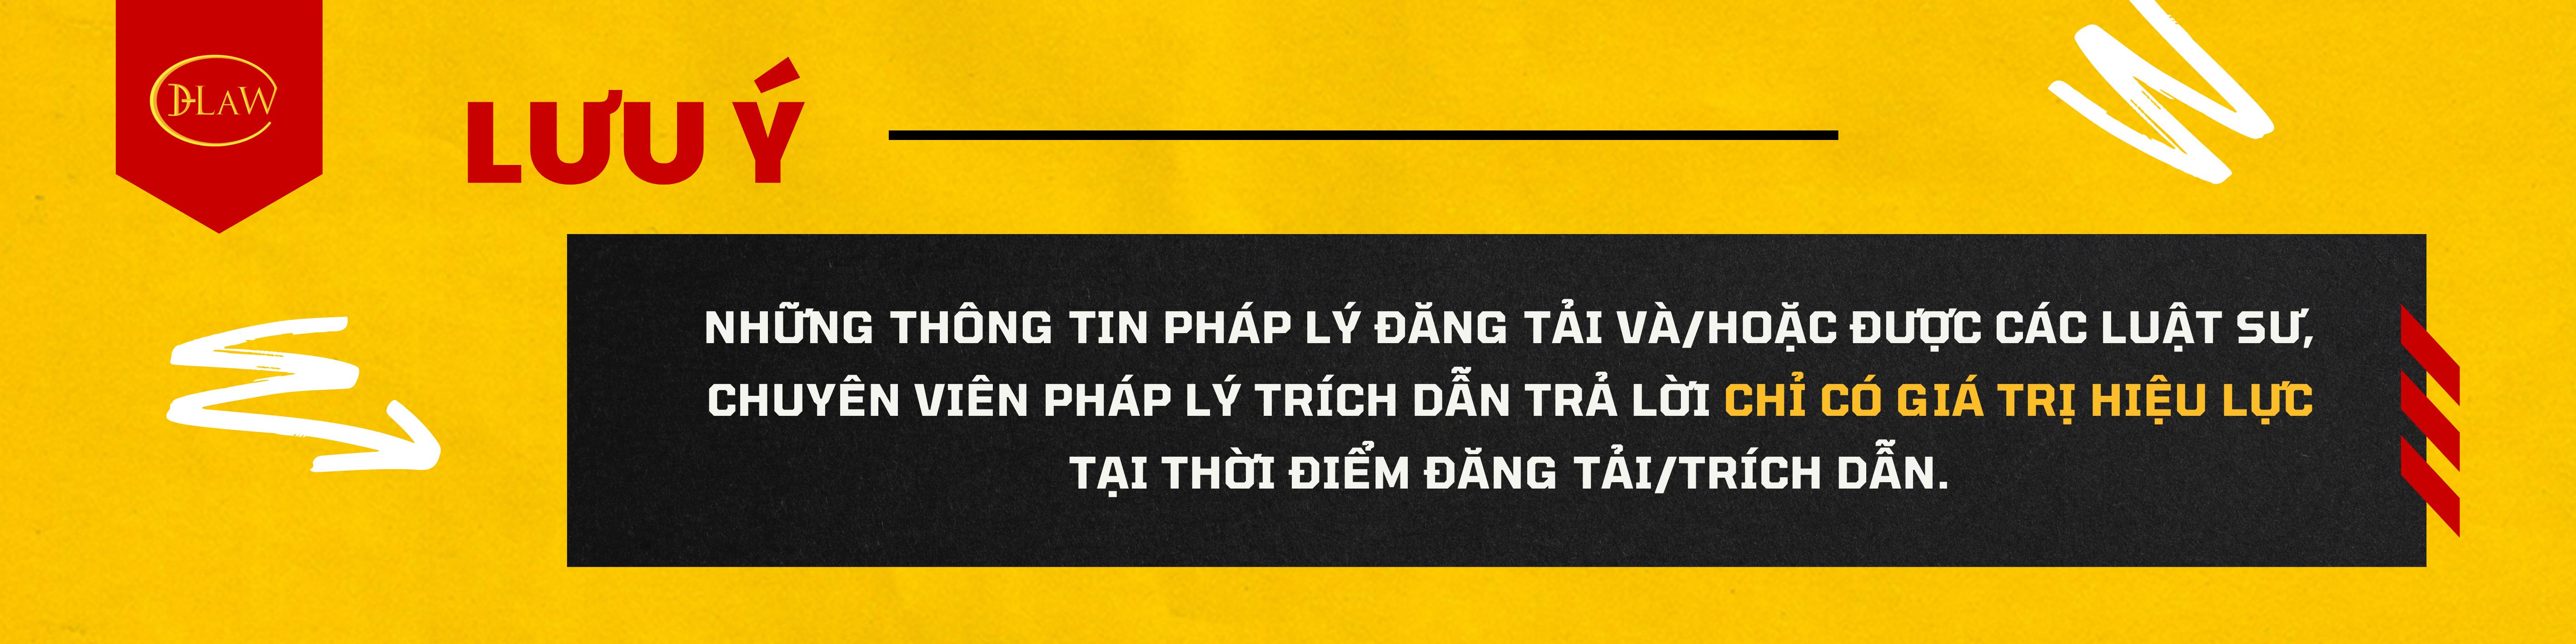 Luu y thong tin phap ly dang tai